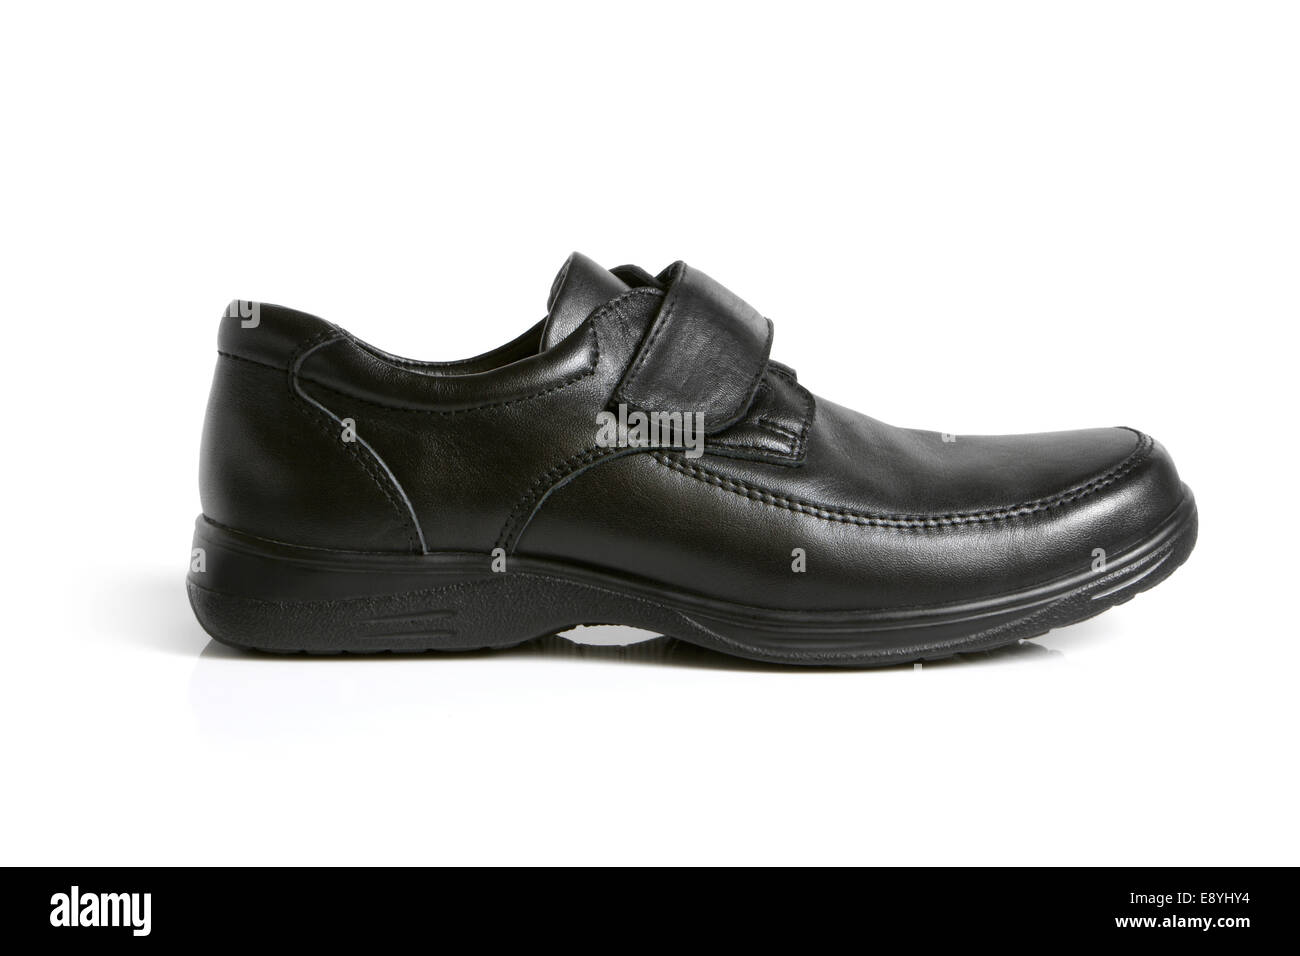 Black shoe - Stock Image